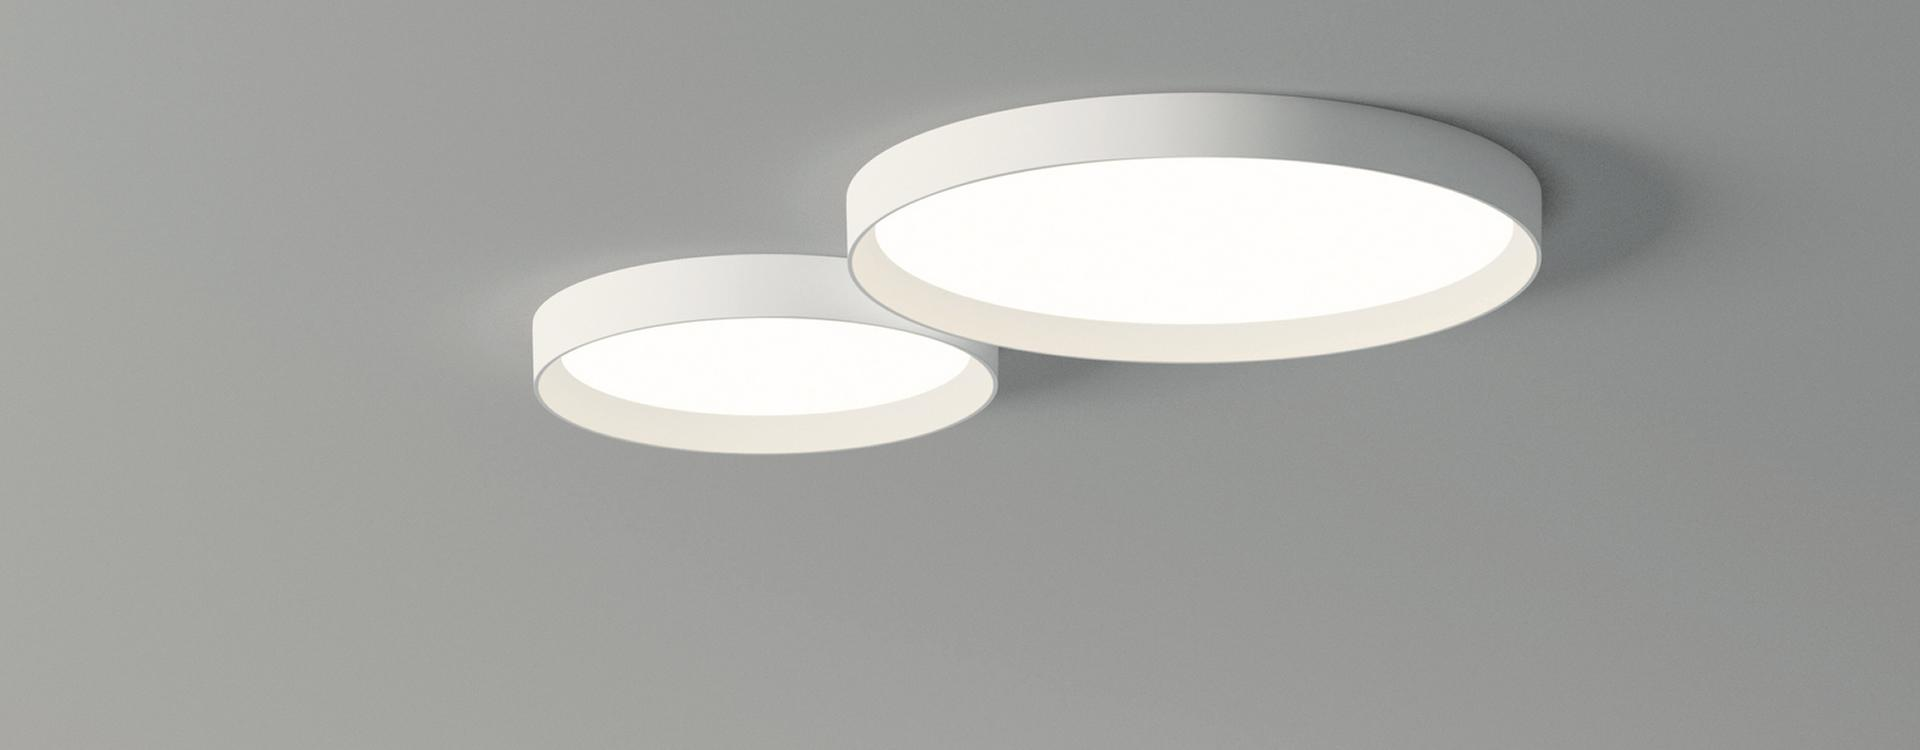 Up Plafón pequeño 1 x placa LED 30w - Lacado blanco mate